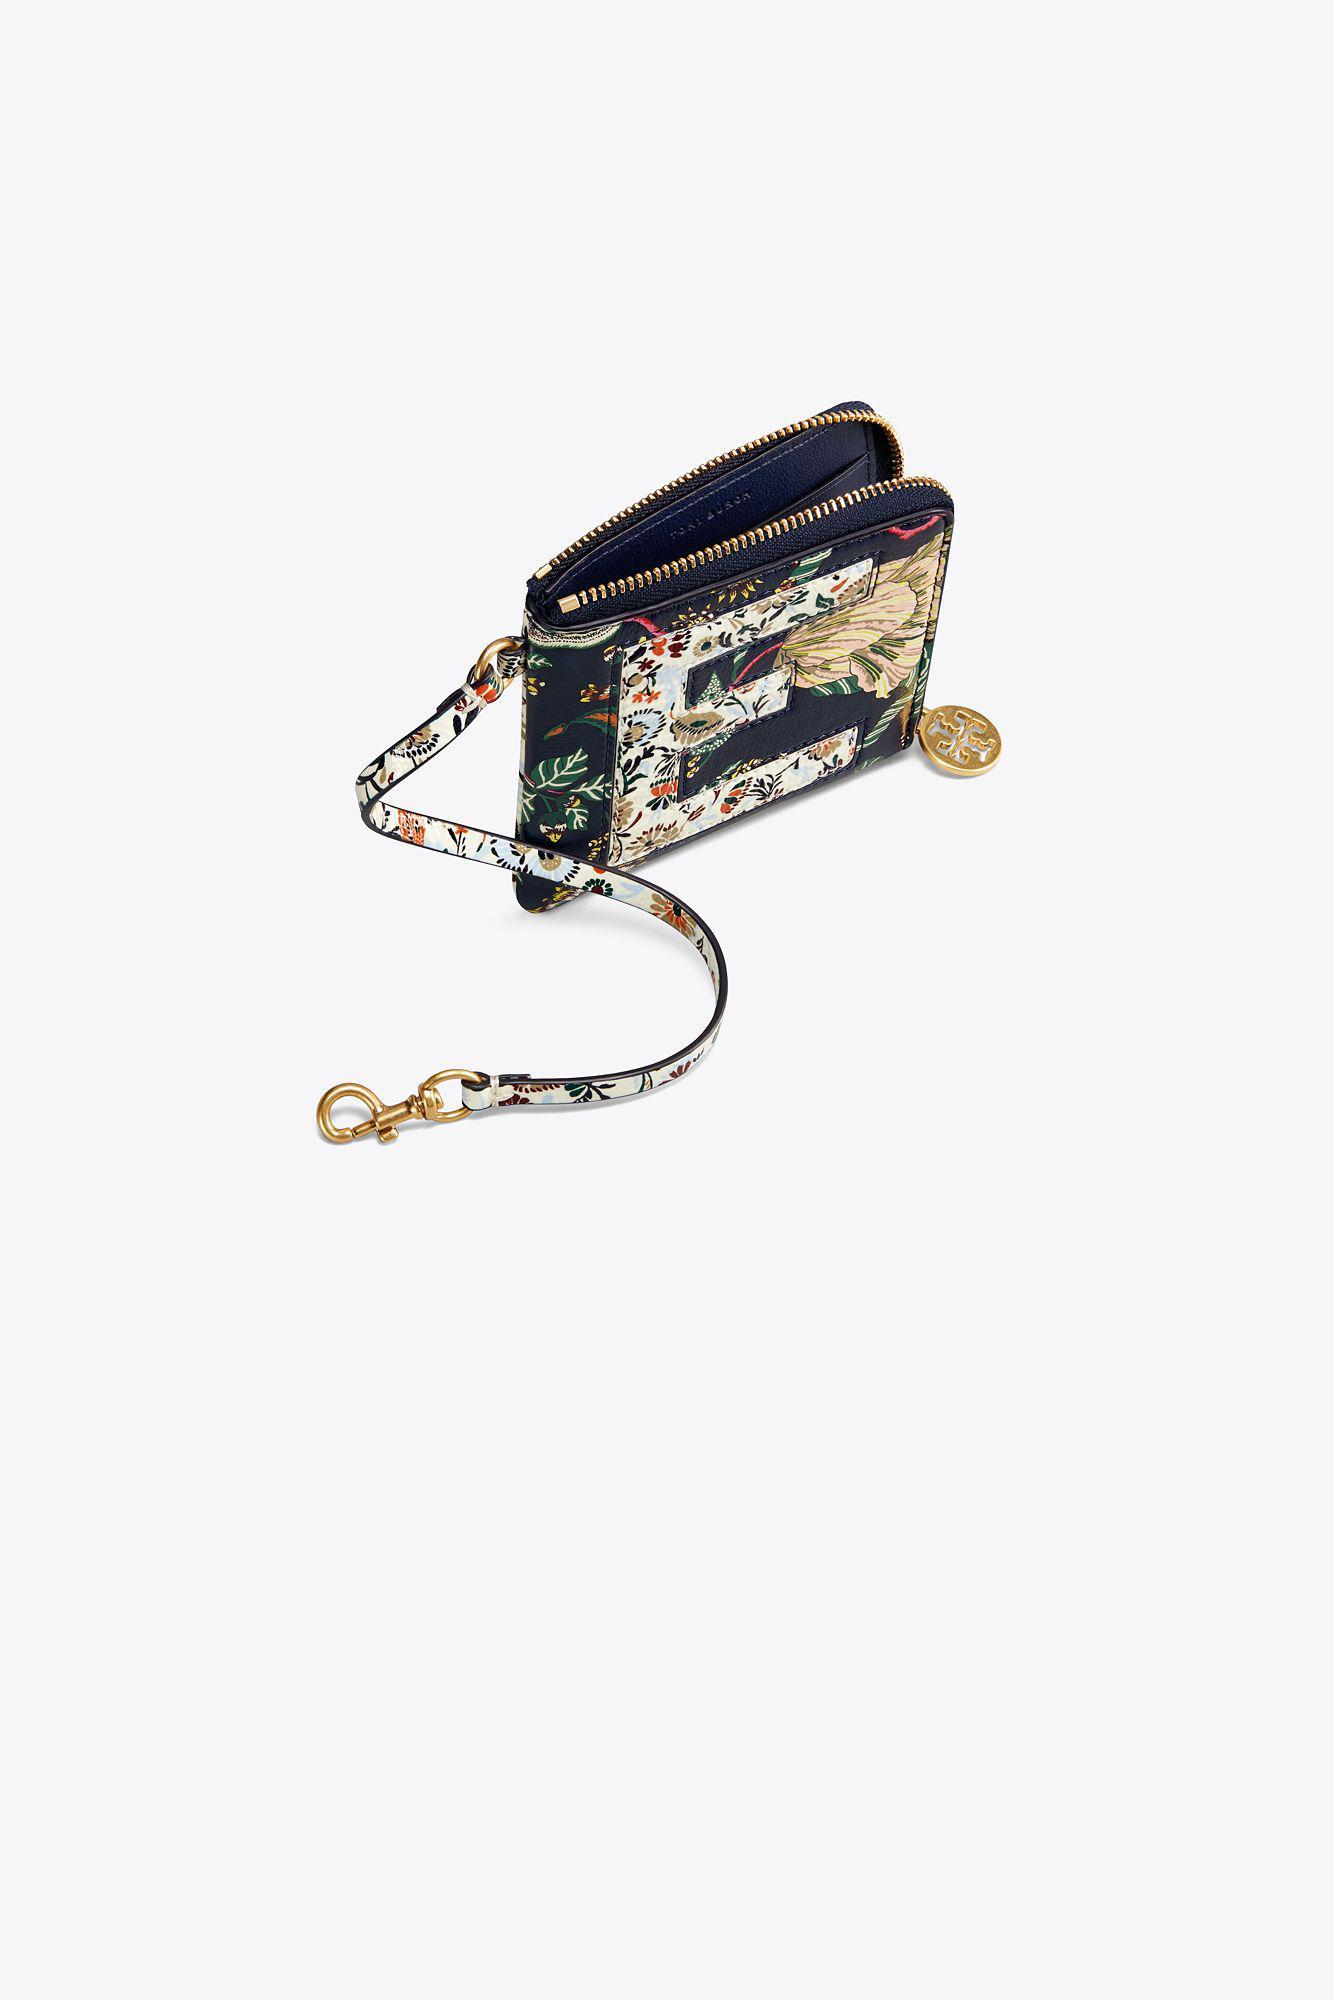 quality design 2e4c0 f33bc Tory Burch Monogram Card Case Key Ring - Lyst